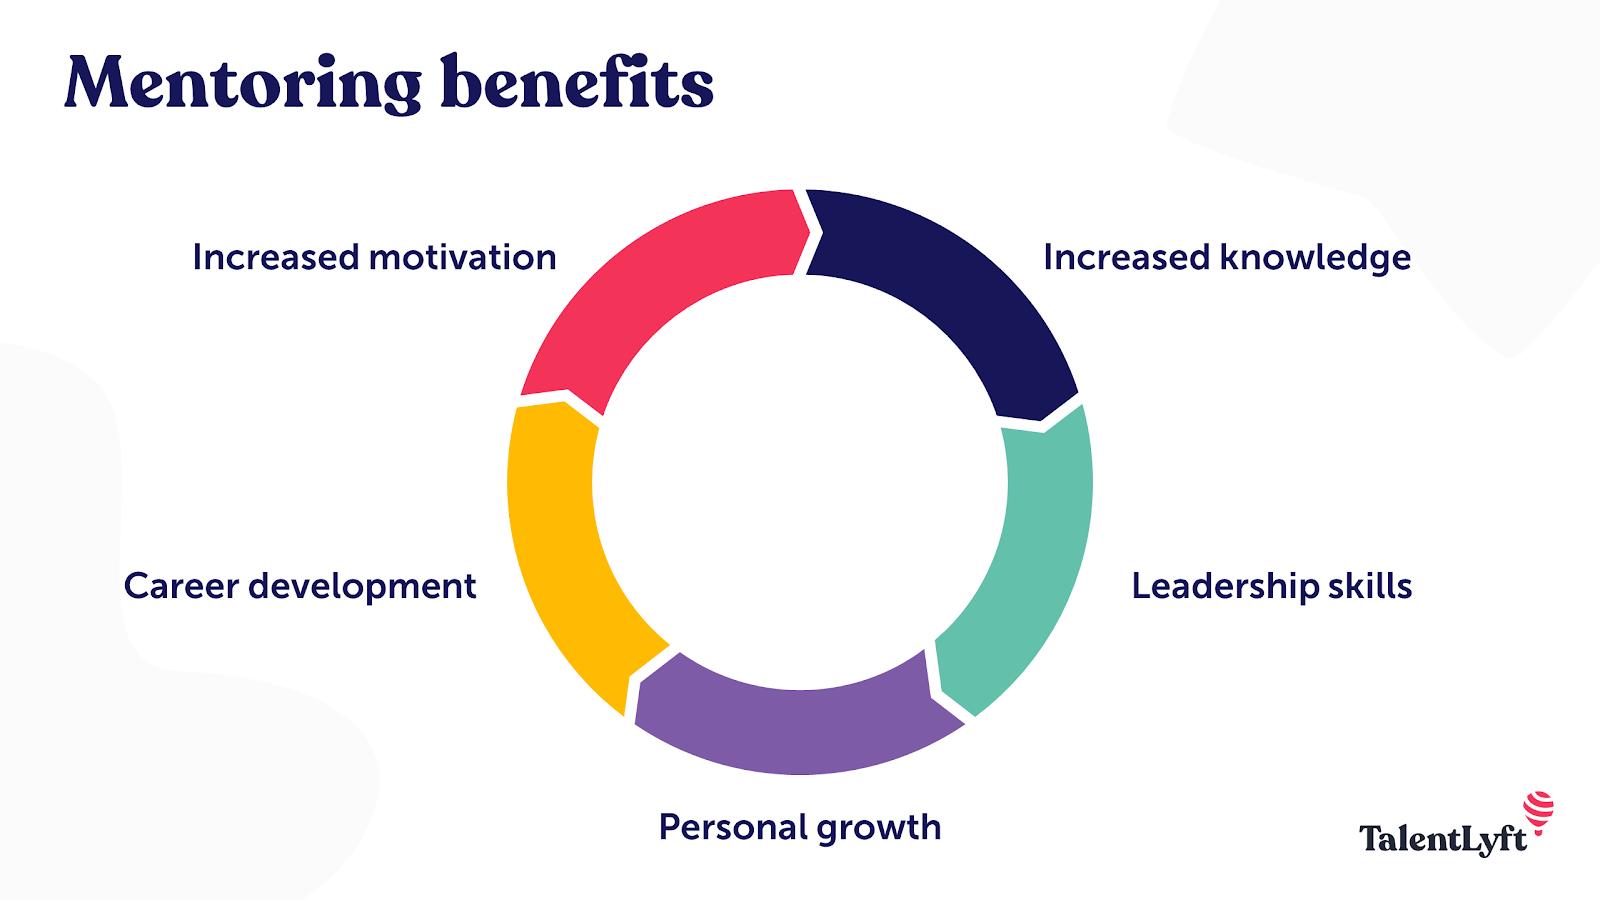 New hire mentoring benefits